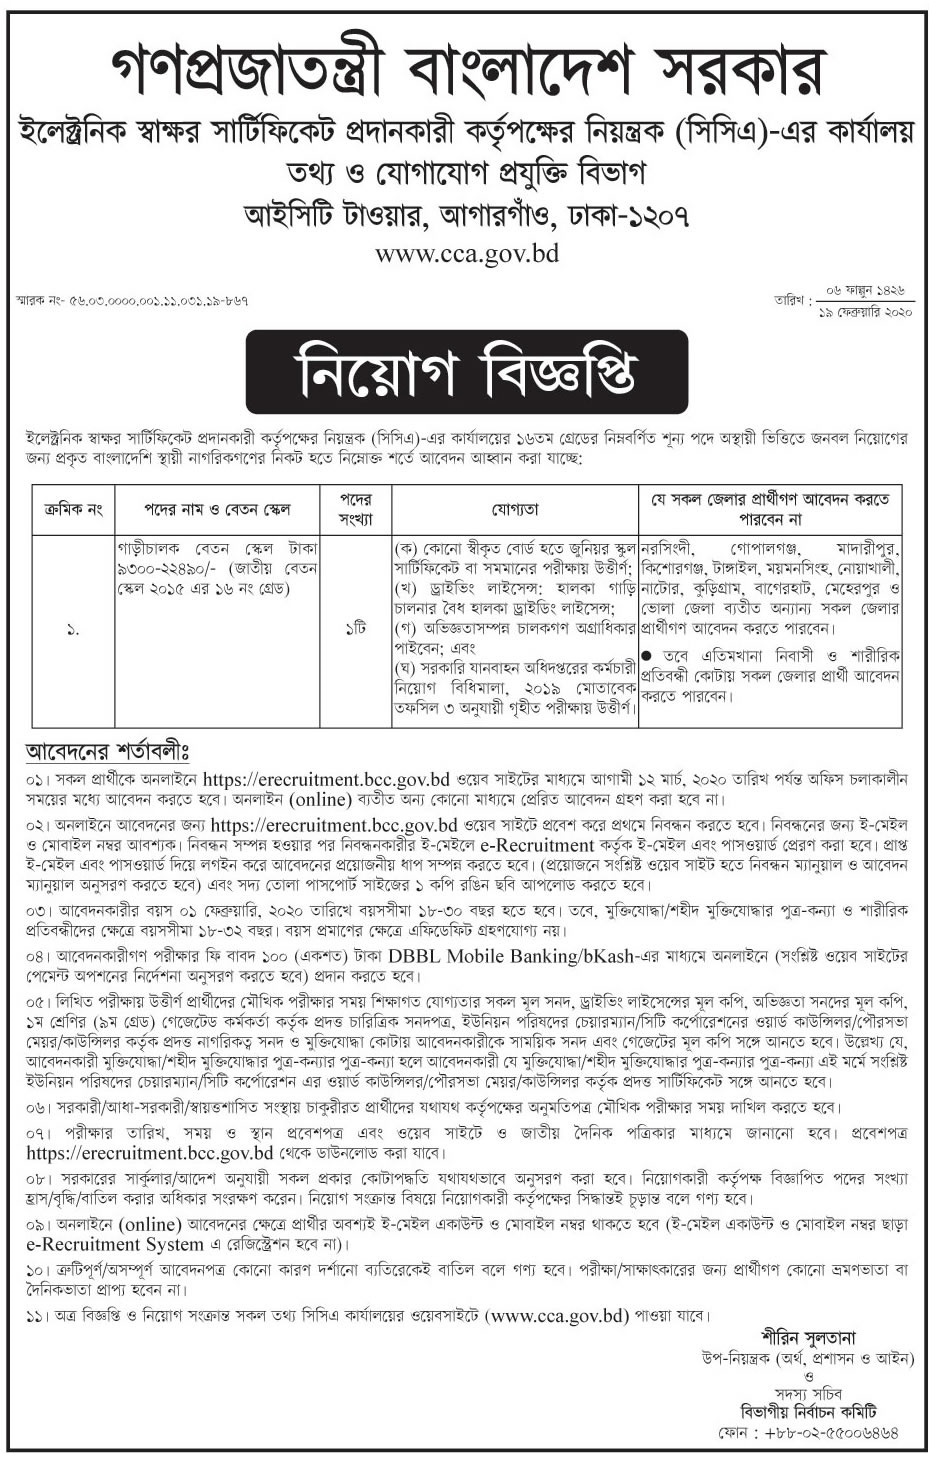 Information and Communication Technology Division Job Circular 2020